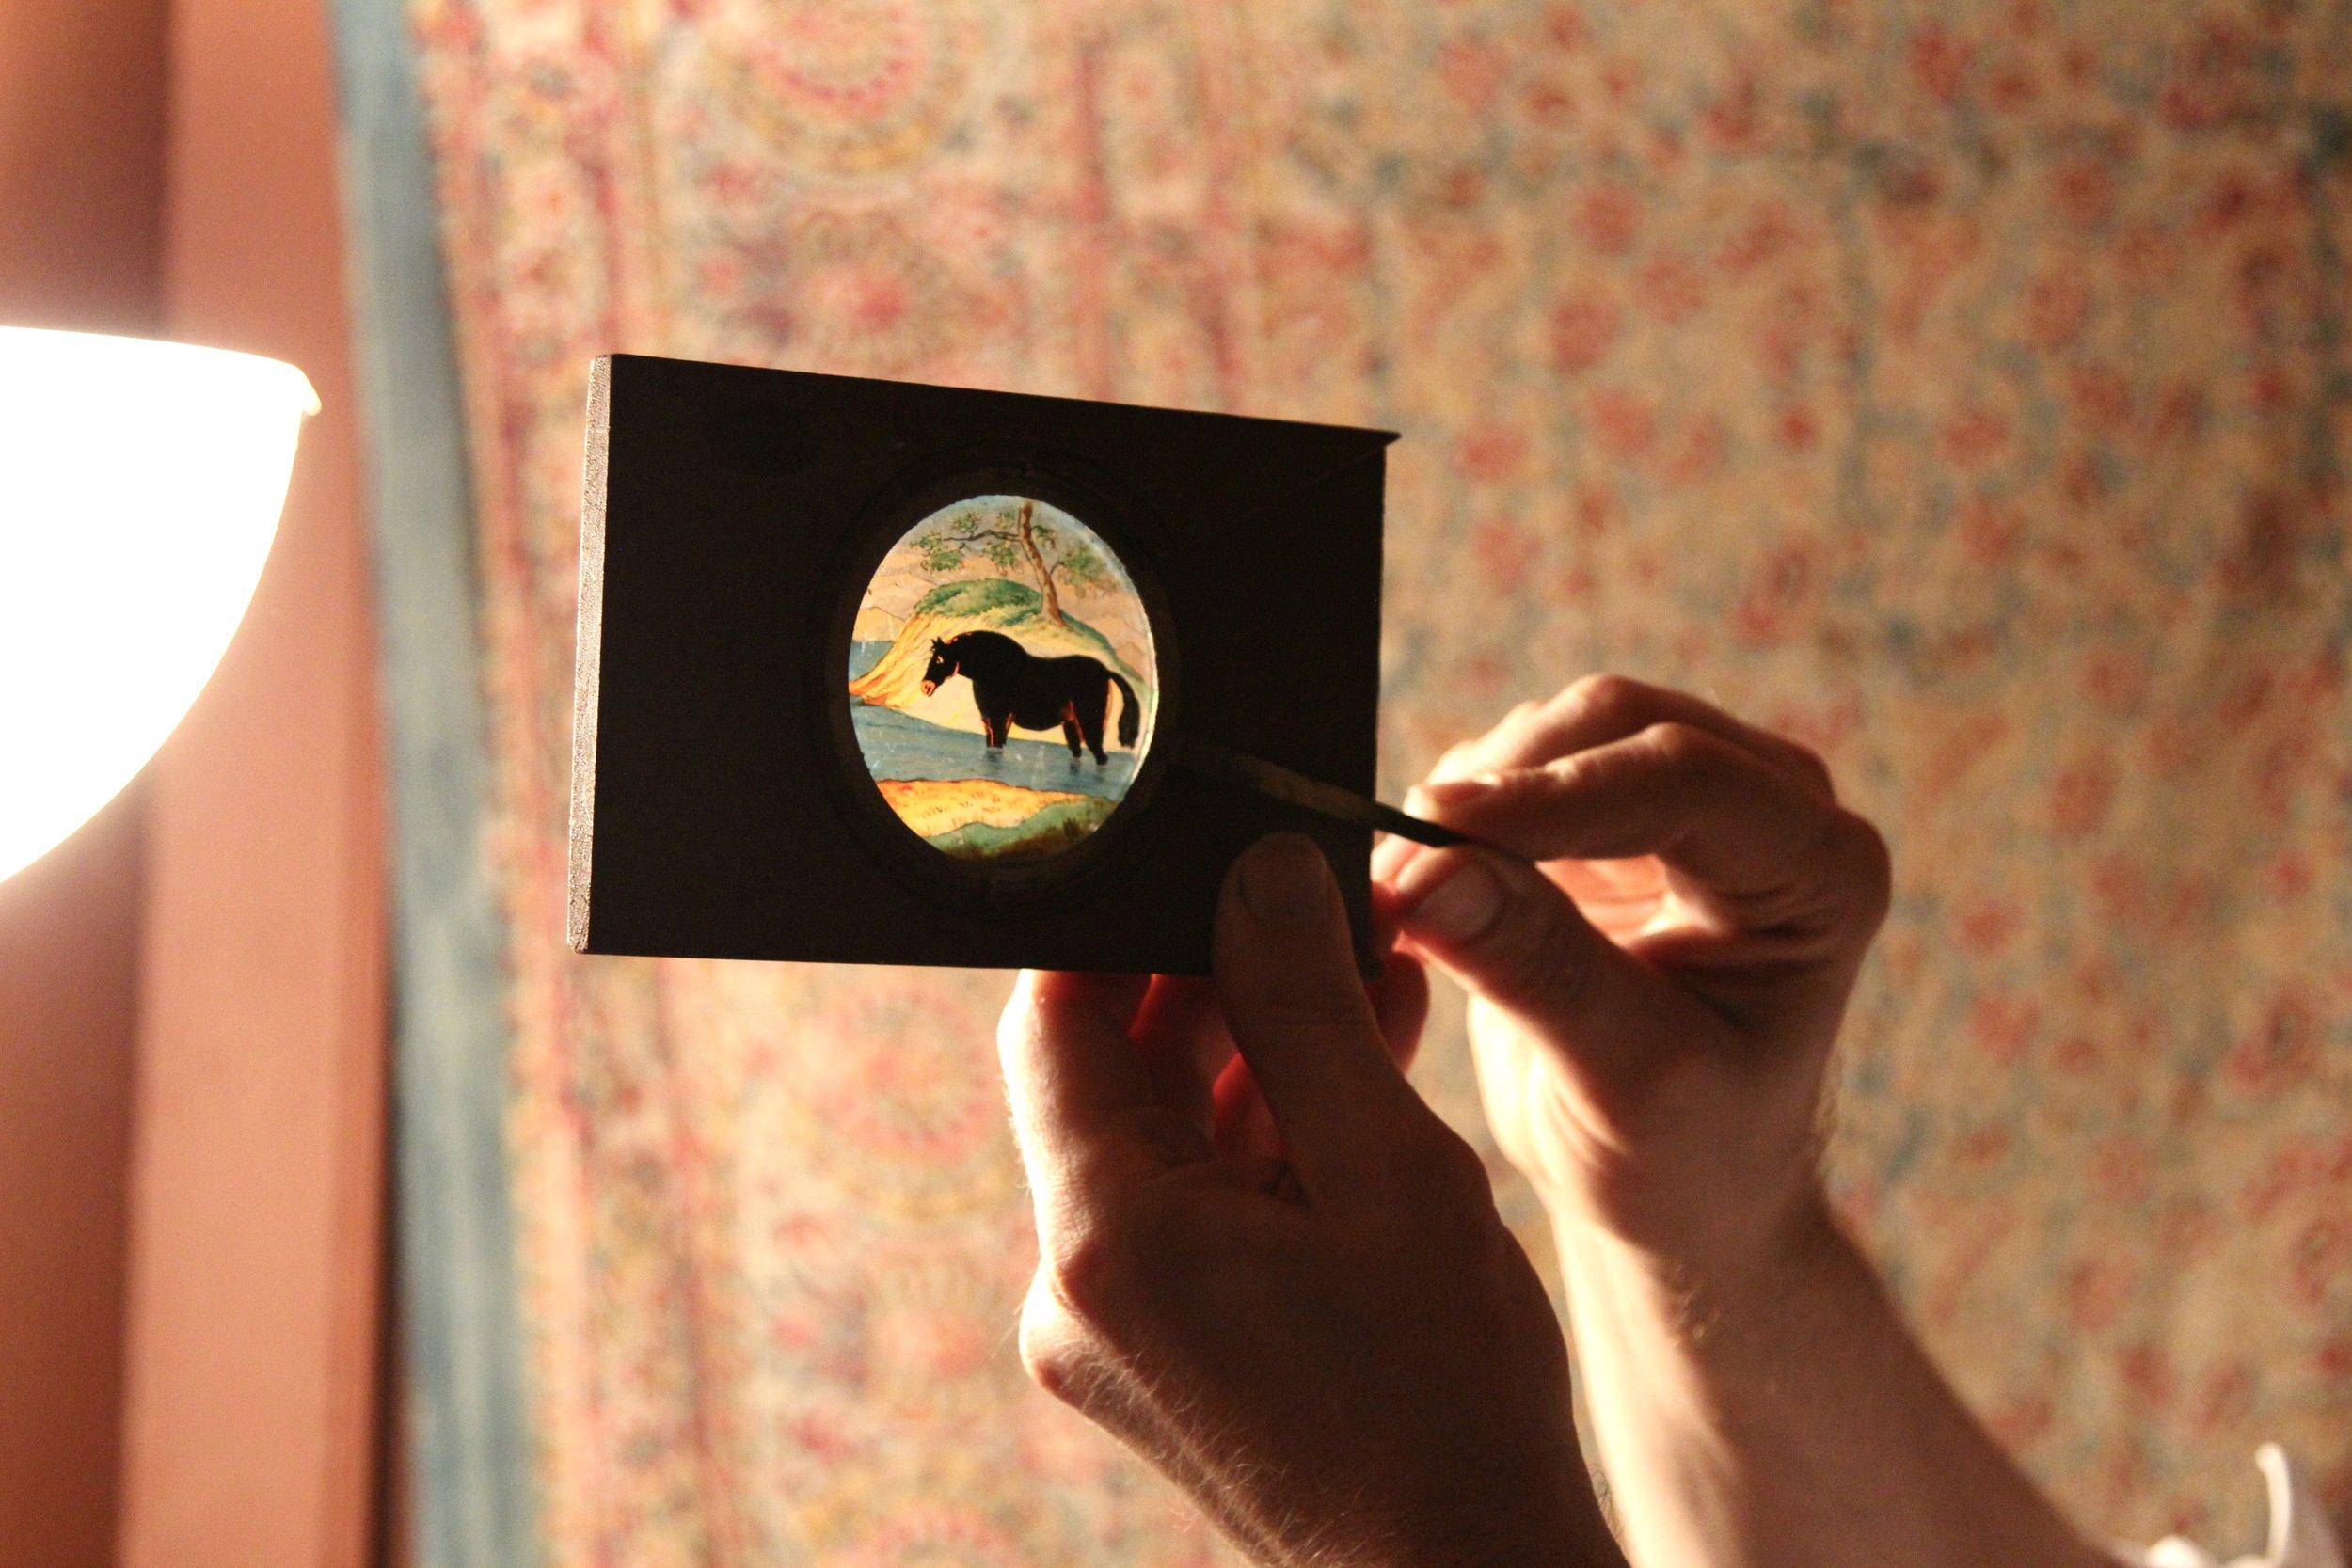 A sneak peak of a 'slip' magic lantern slide as part of a series of hand painted 'slip' slides